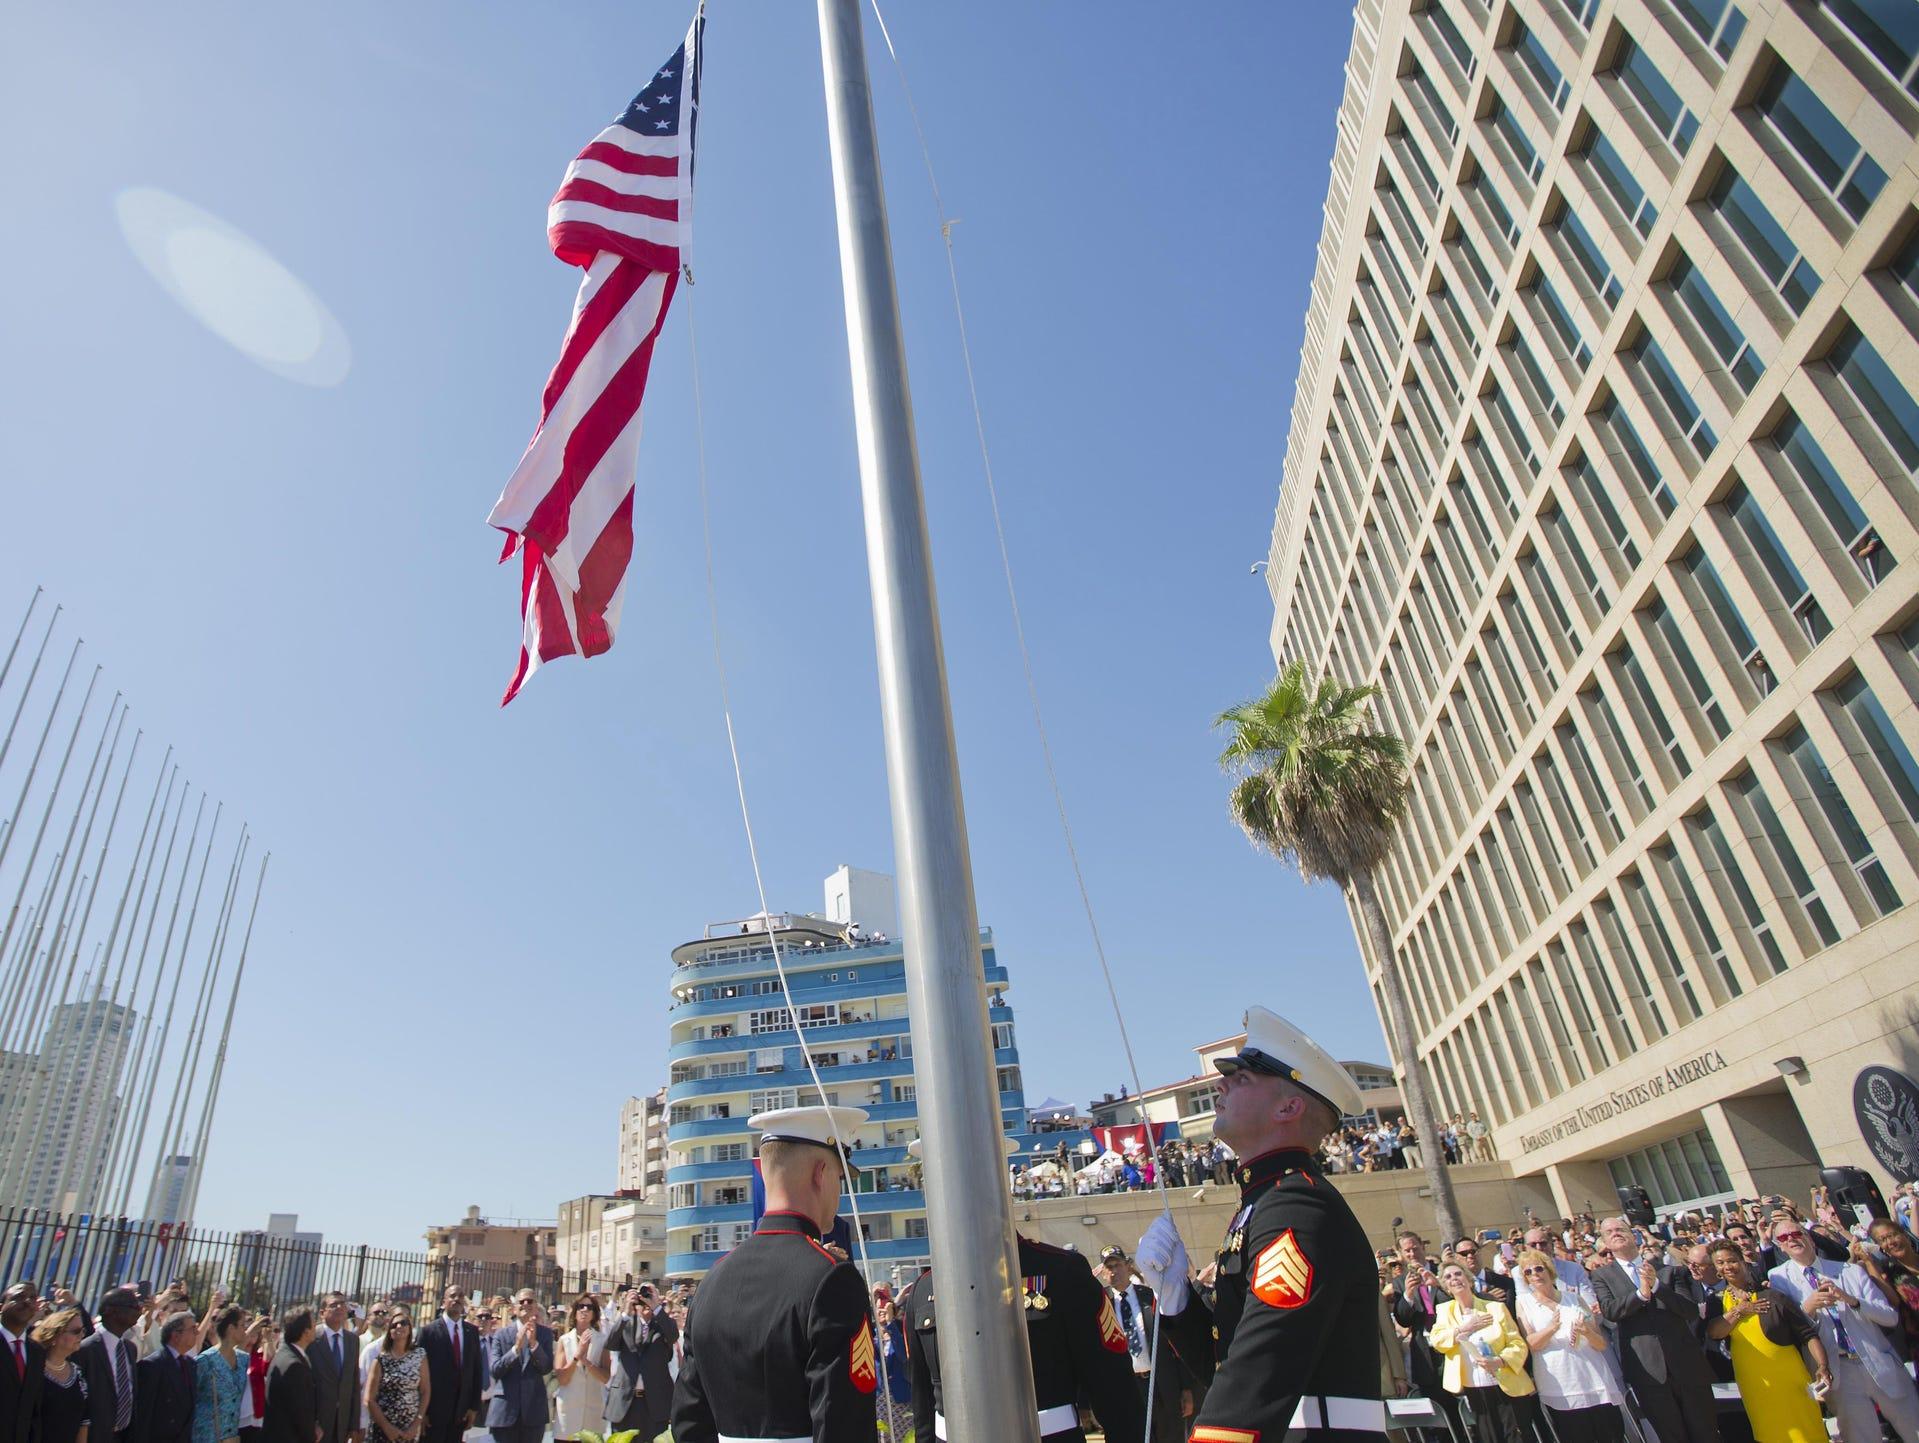 Members of the U.S. Marine Corps raise the U.S. flag